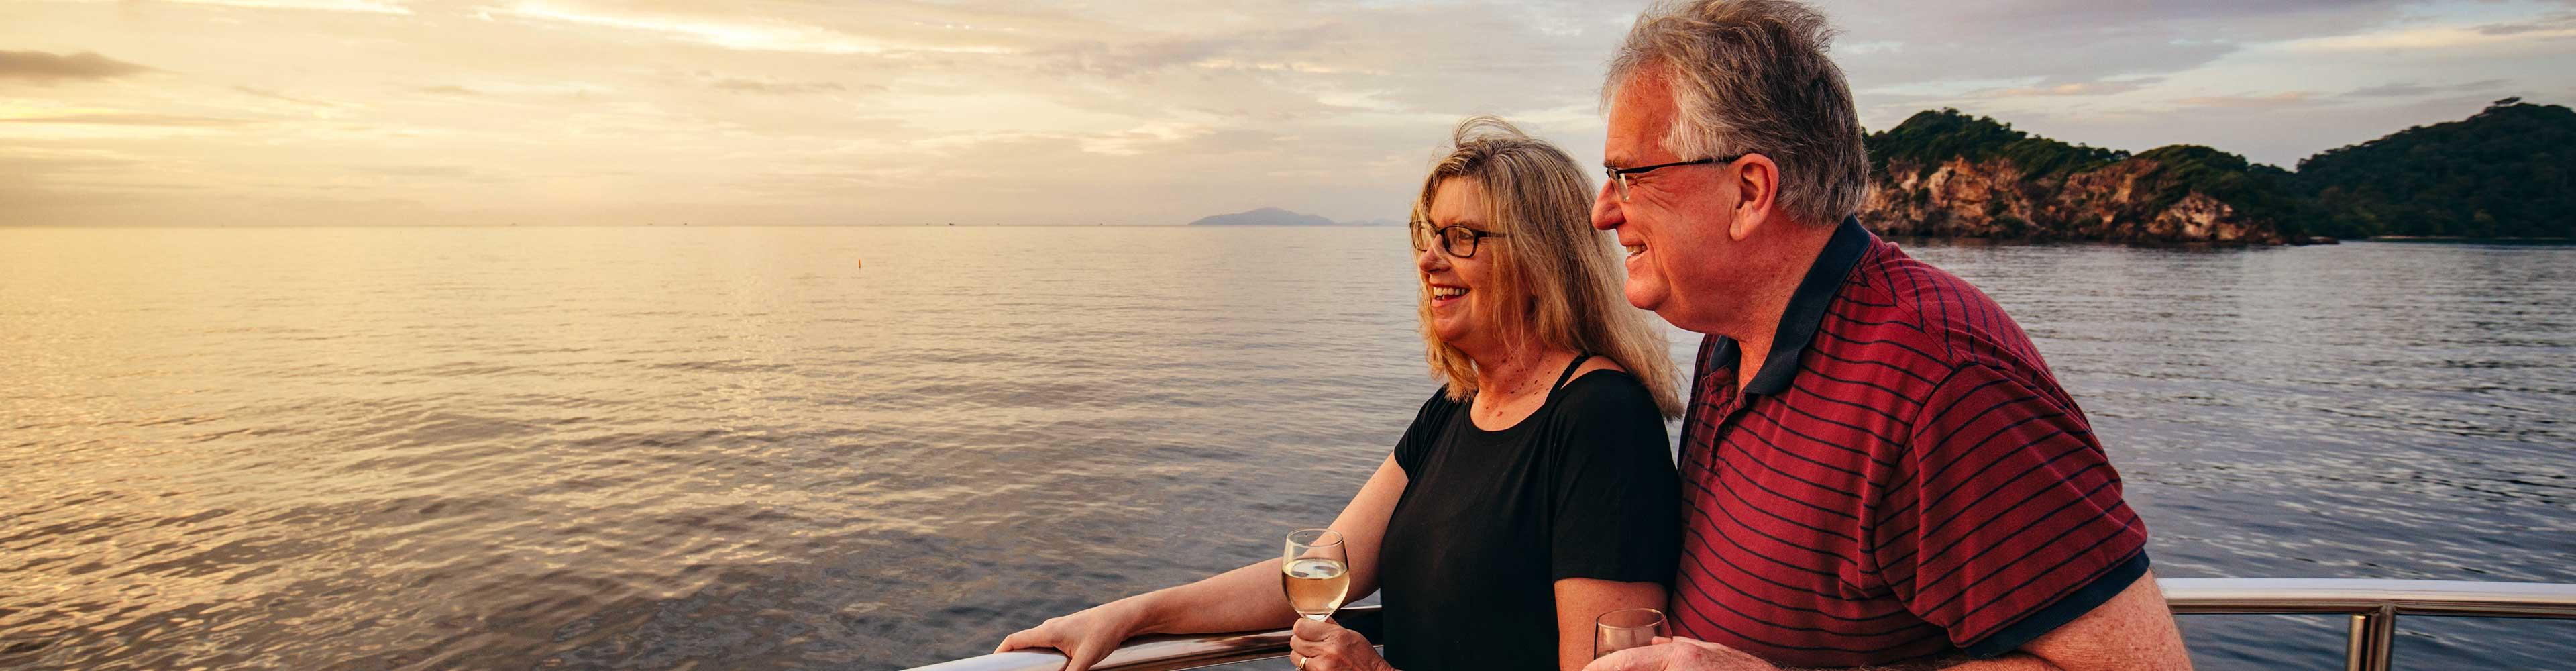 Borneo and the Malaysian and Thai Islands by Land and Sea – Phuket to Kota Kinabalu